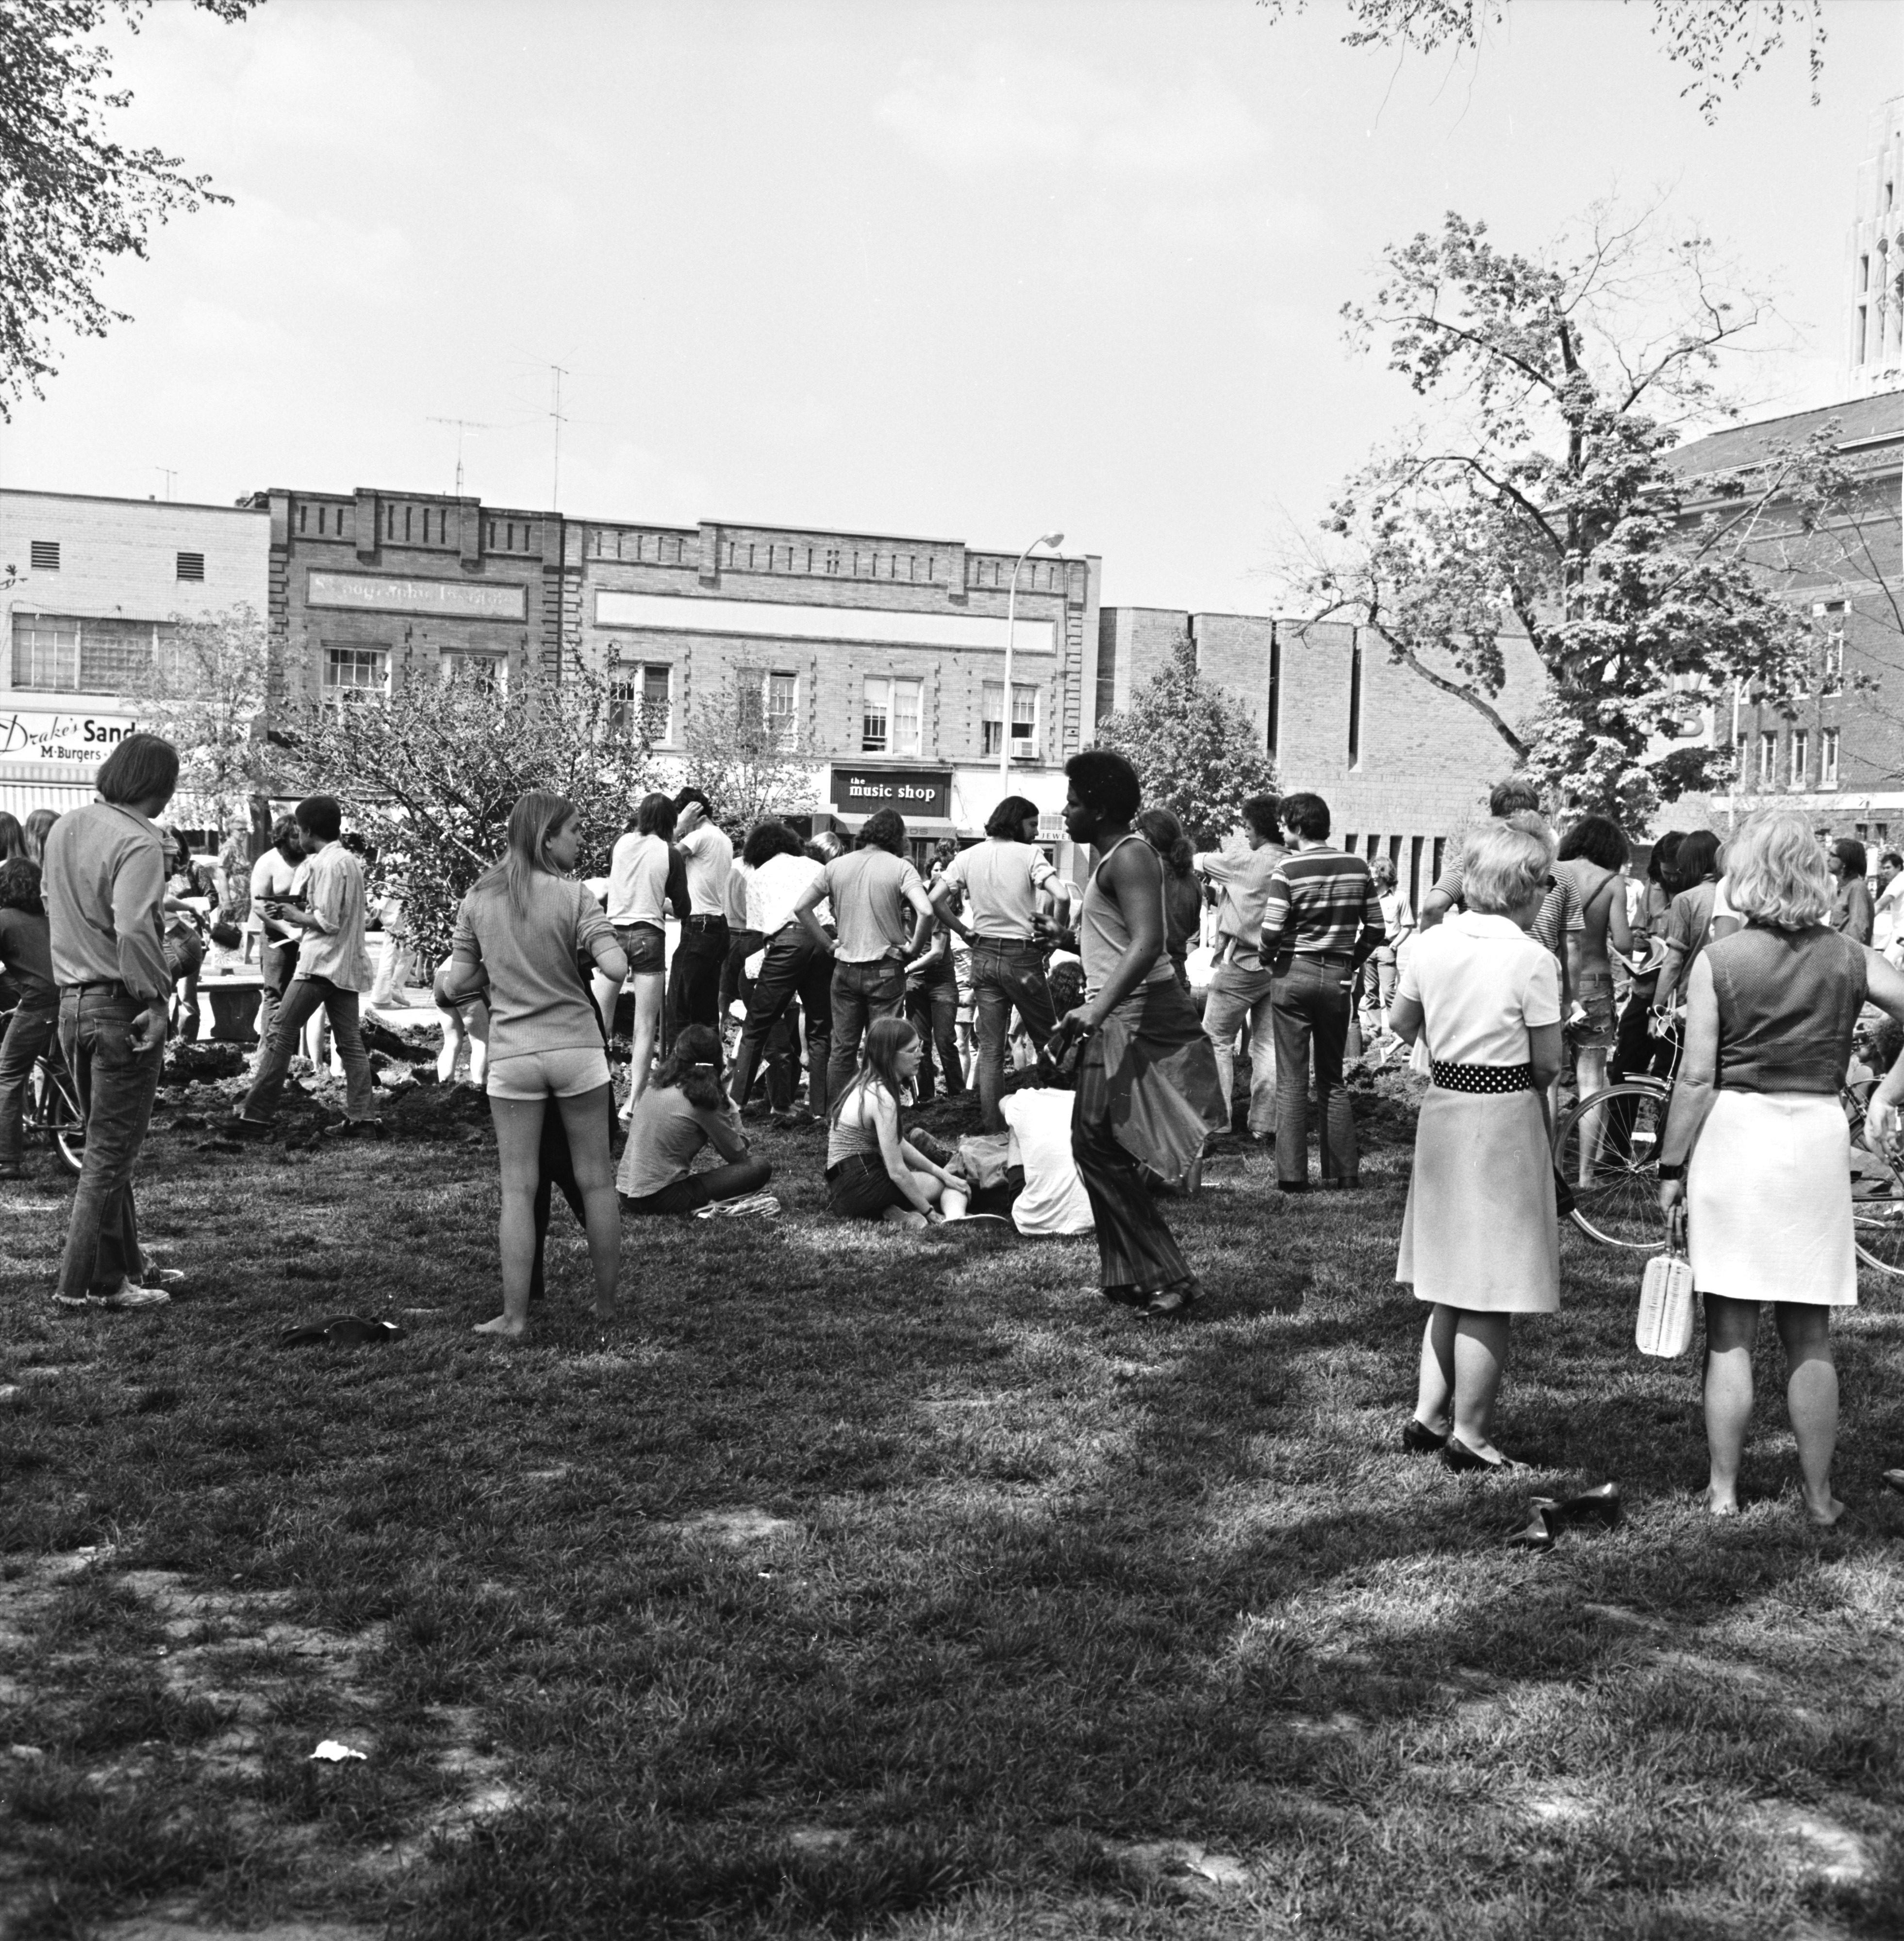 813575828e80d2 Old News Photos | Ann Arbor District Library